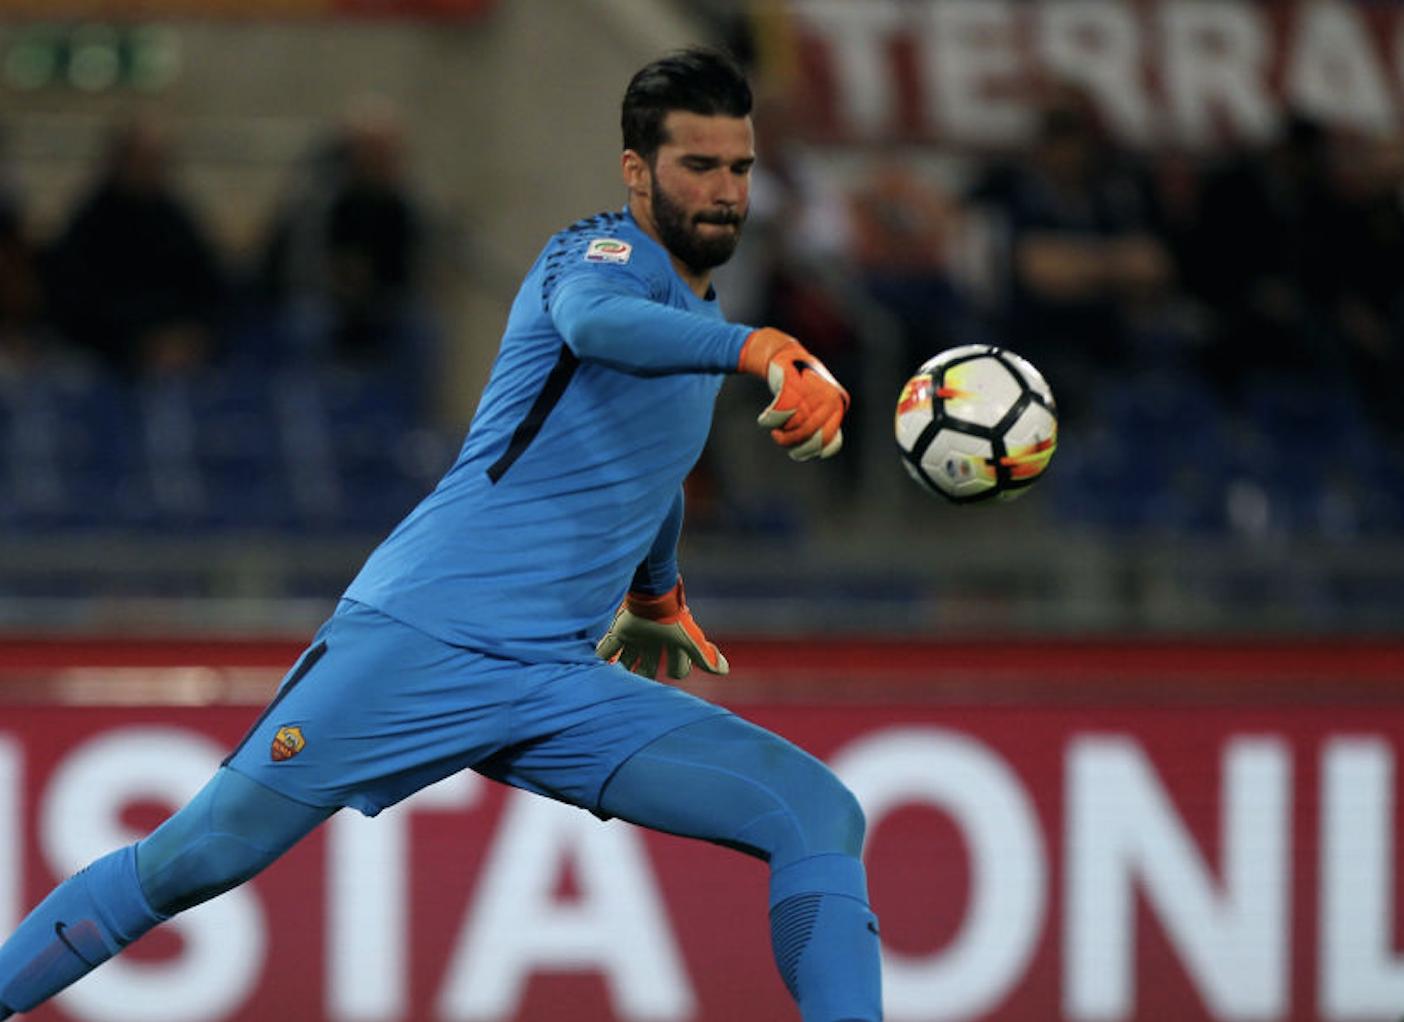 Serie A, nervi tesi in casa Roma: lite tra Dzeko e Florenzi